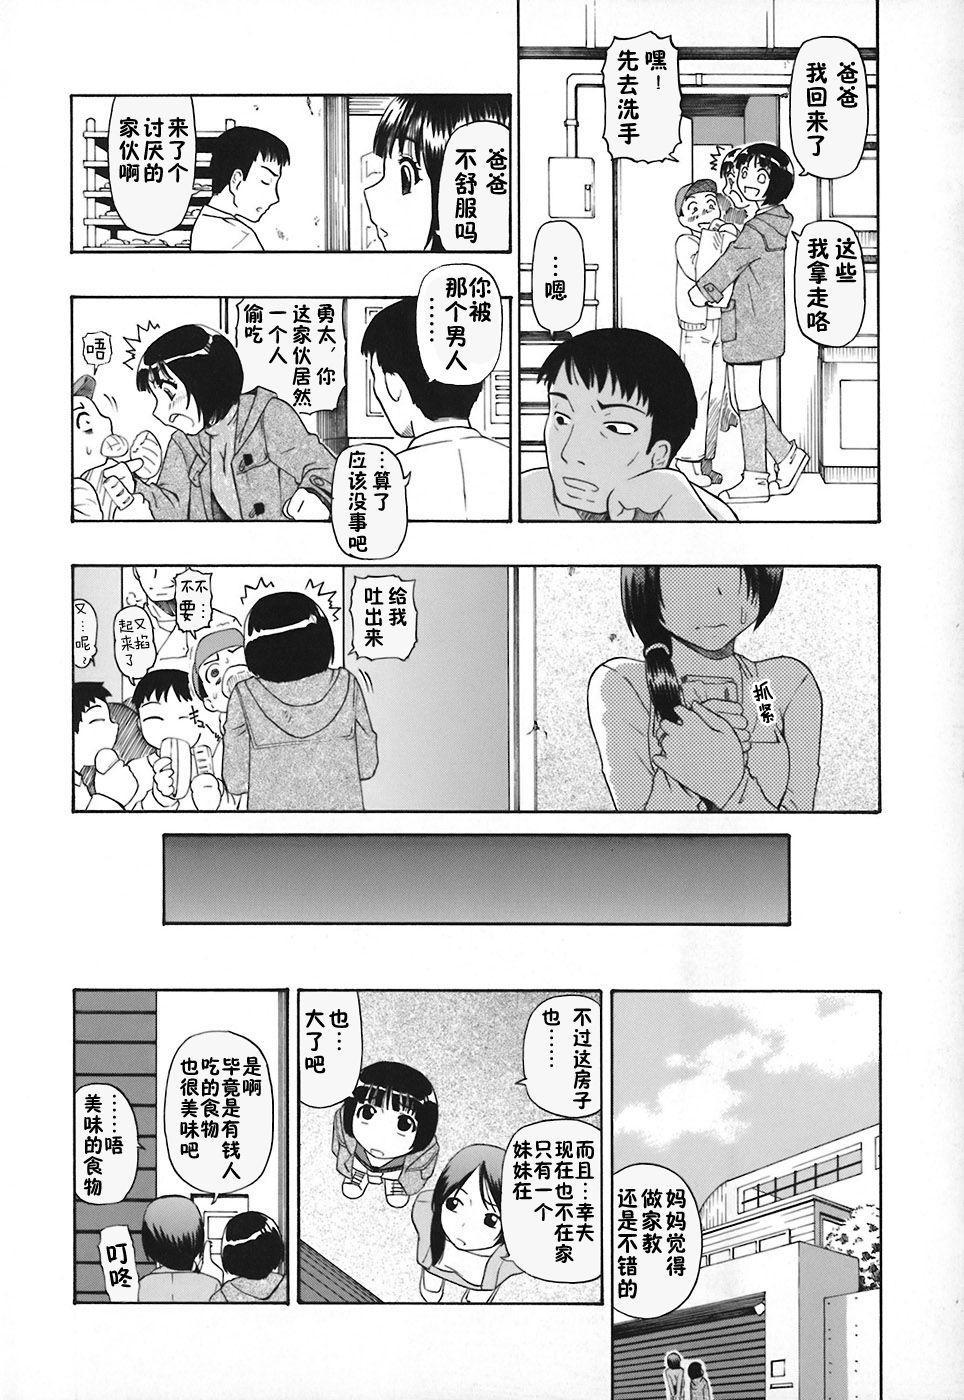 Akutoku no Sakae - Prosperites du Vice 11